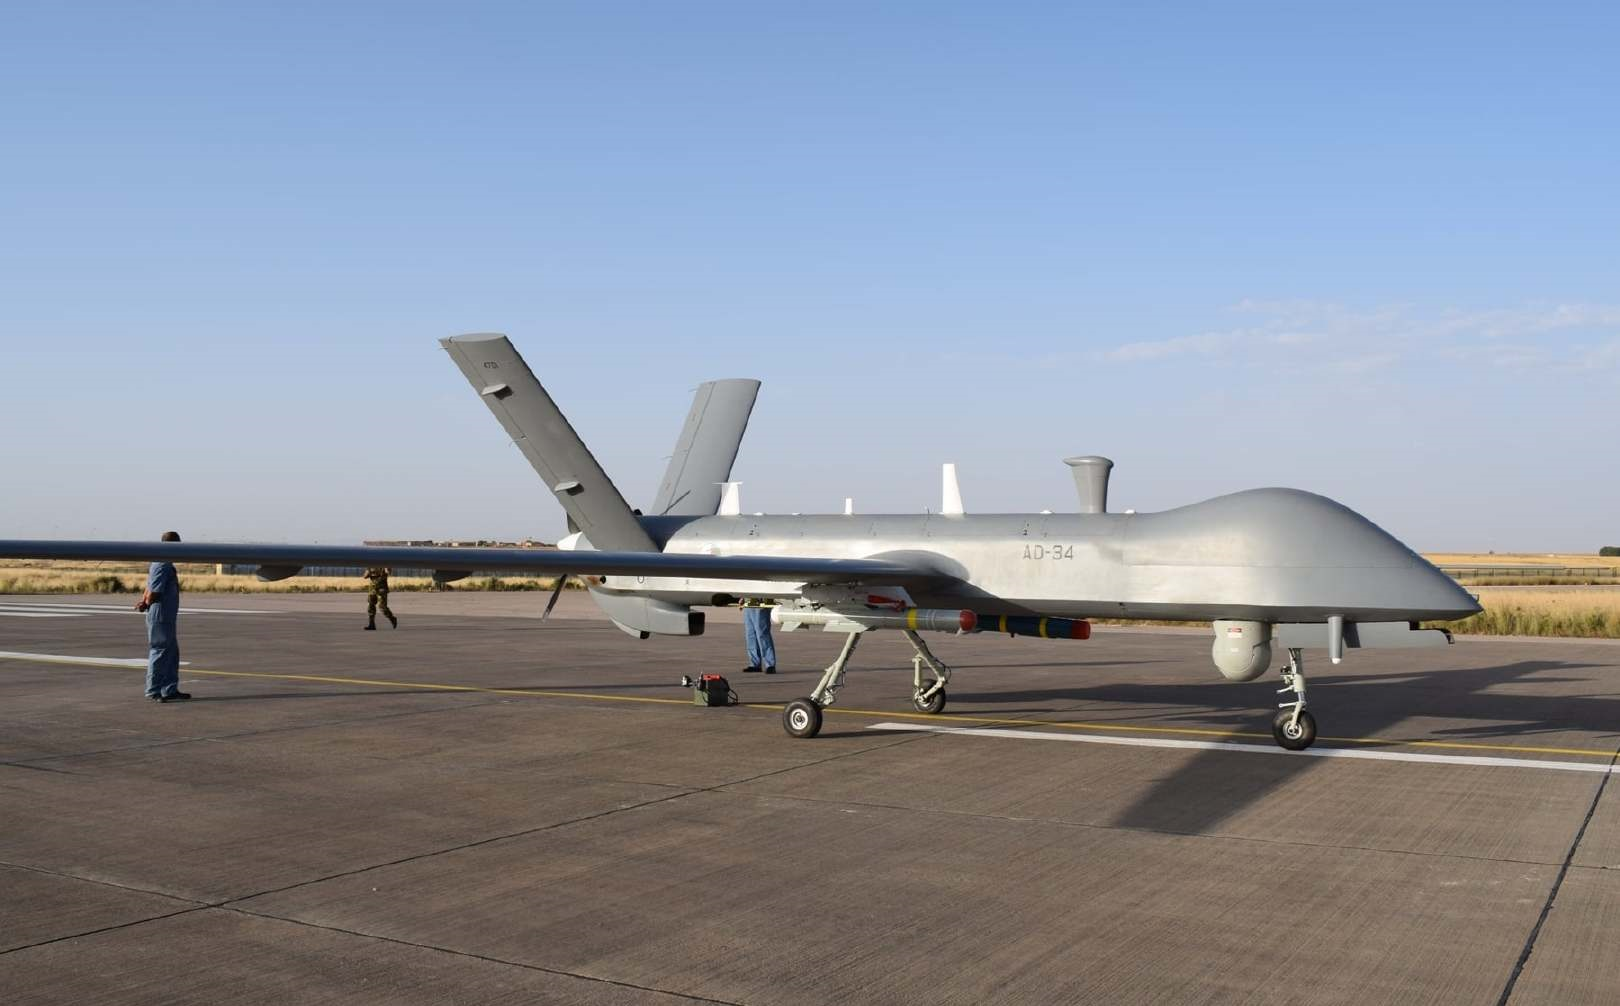 uav, drone, ch-4